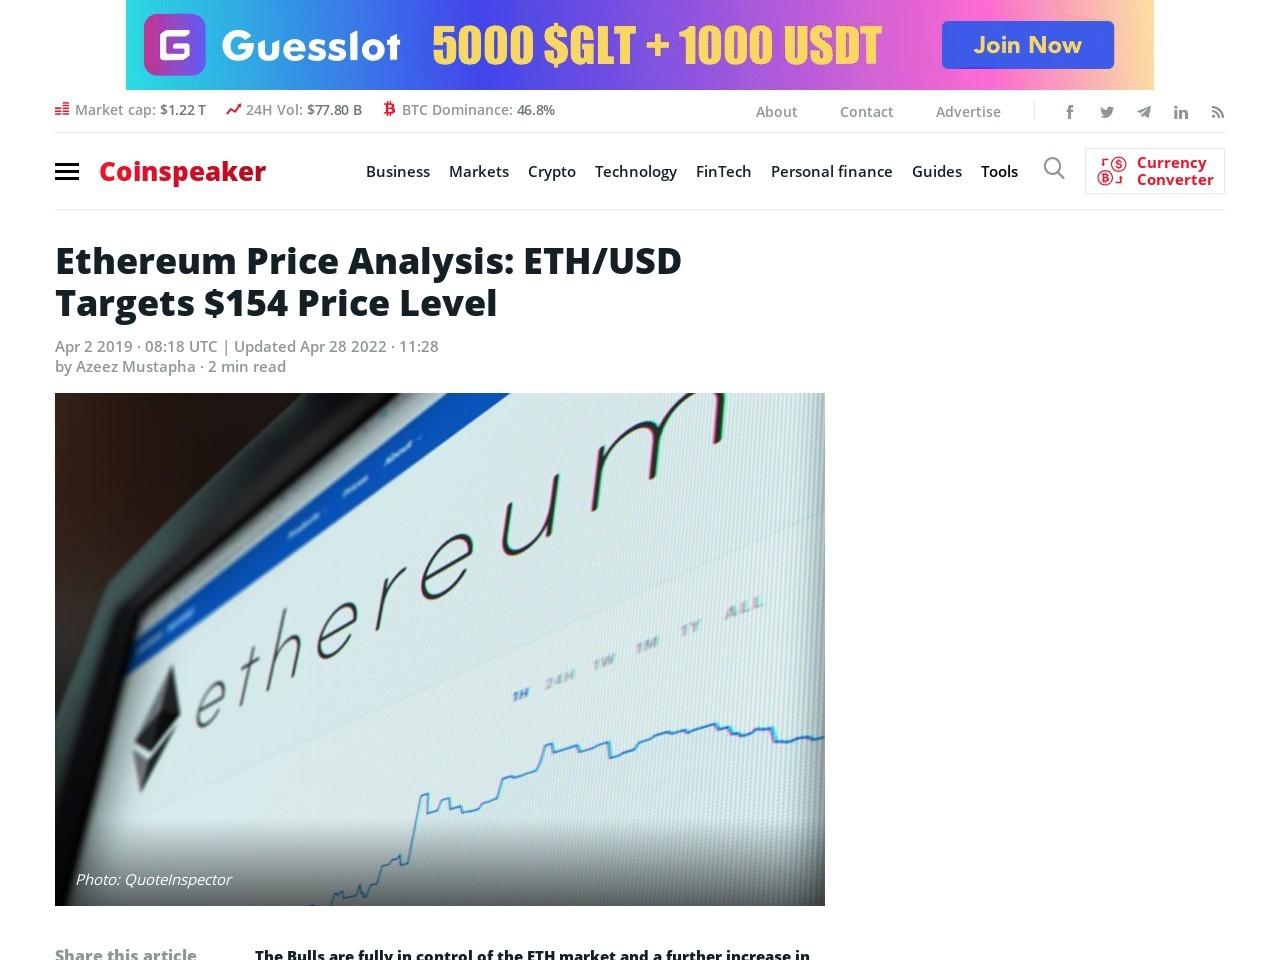 Ethereum Price Analysis: ETH/USD Targets $154 Price Level